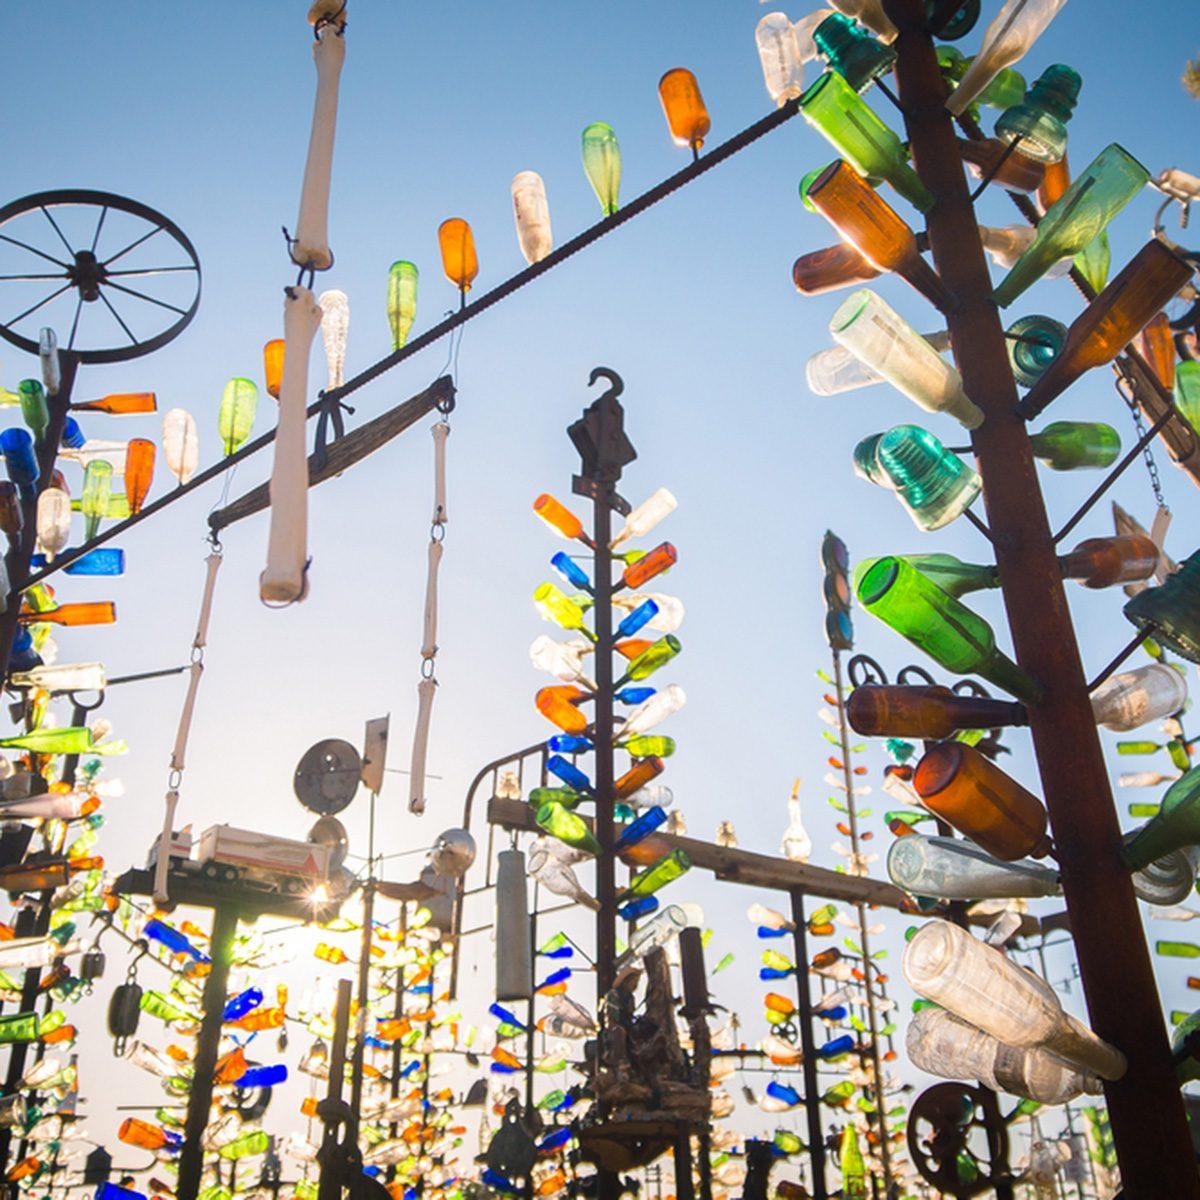 Art installation with collected beer bottle at Elmer's Bottle Tree Ranch, San Bernardino, California.; Shutterstock ID 752773033; Job (TFH, TOH, RD, BNB, CWM, CM): TOH